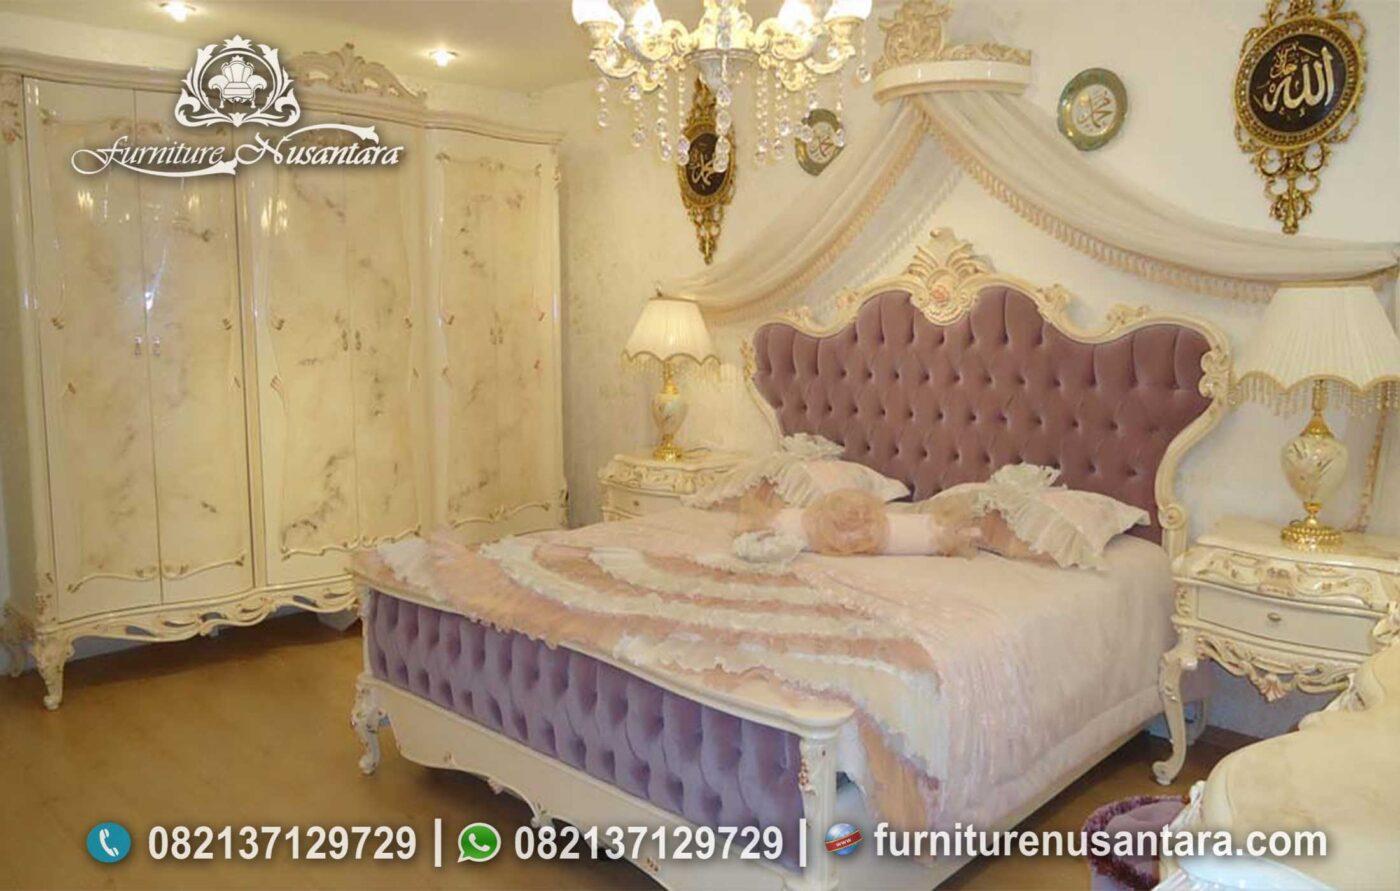 Set Kamar Tidur Klasik Putri Raja KS-170, Furniture Nusantara